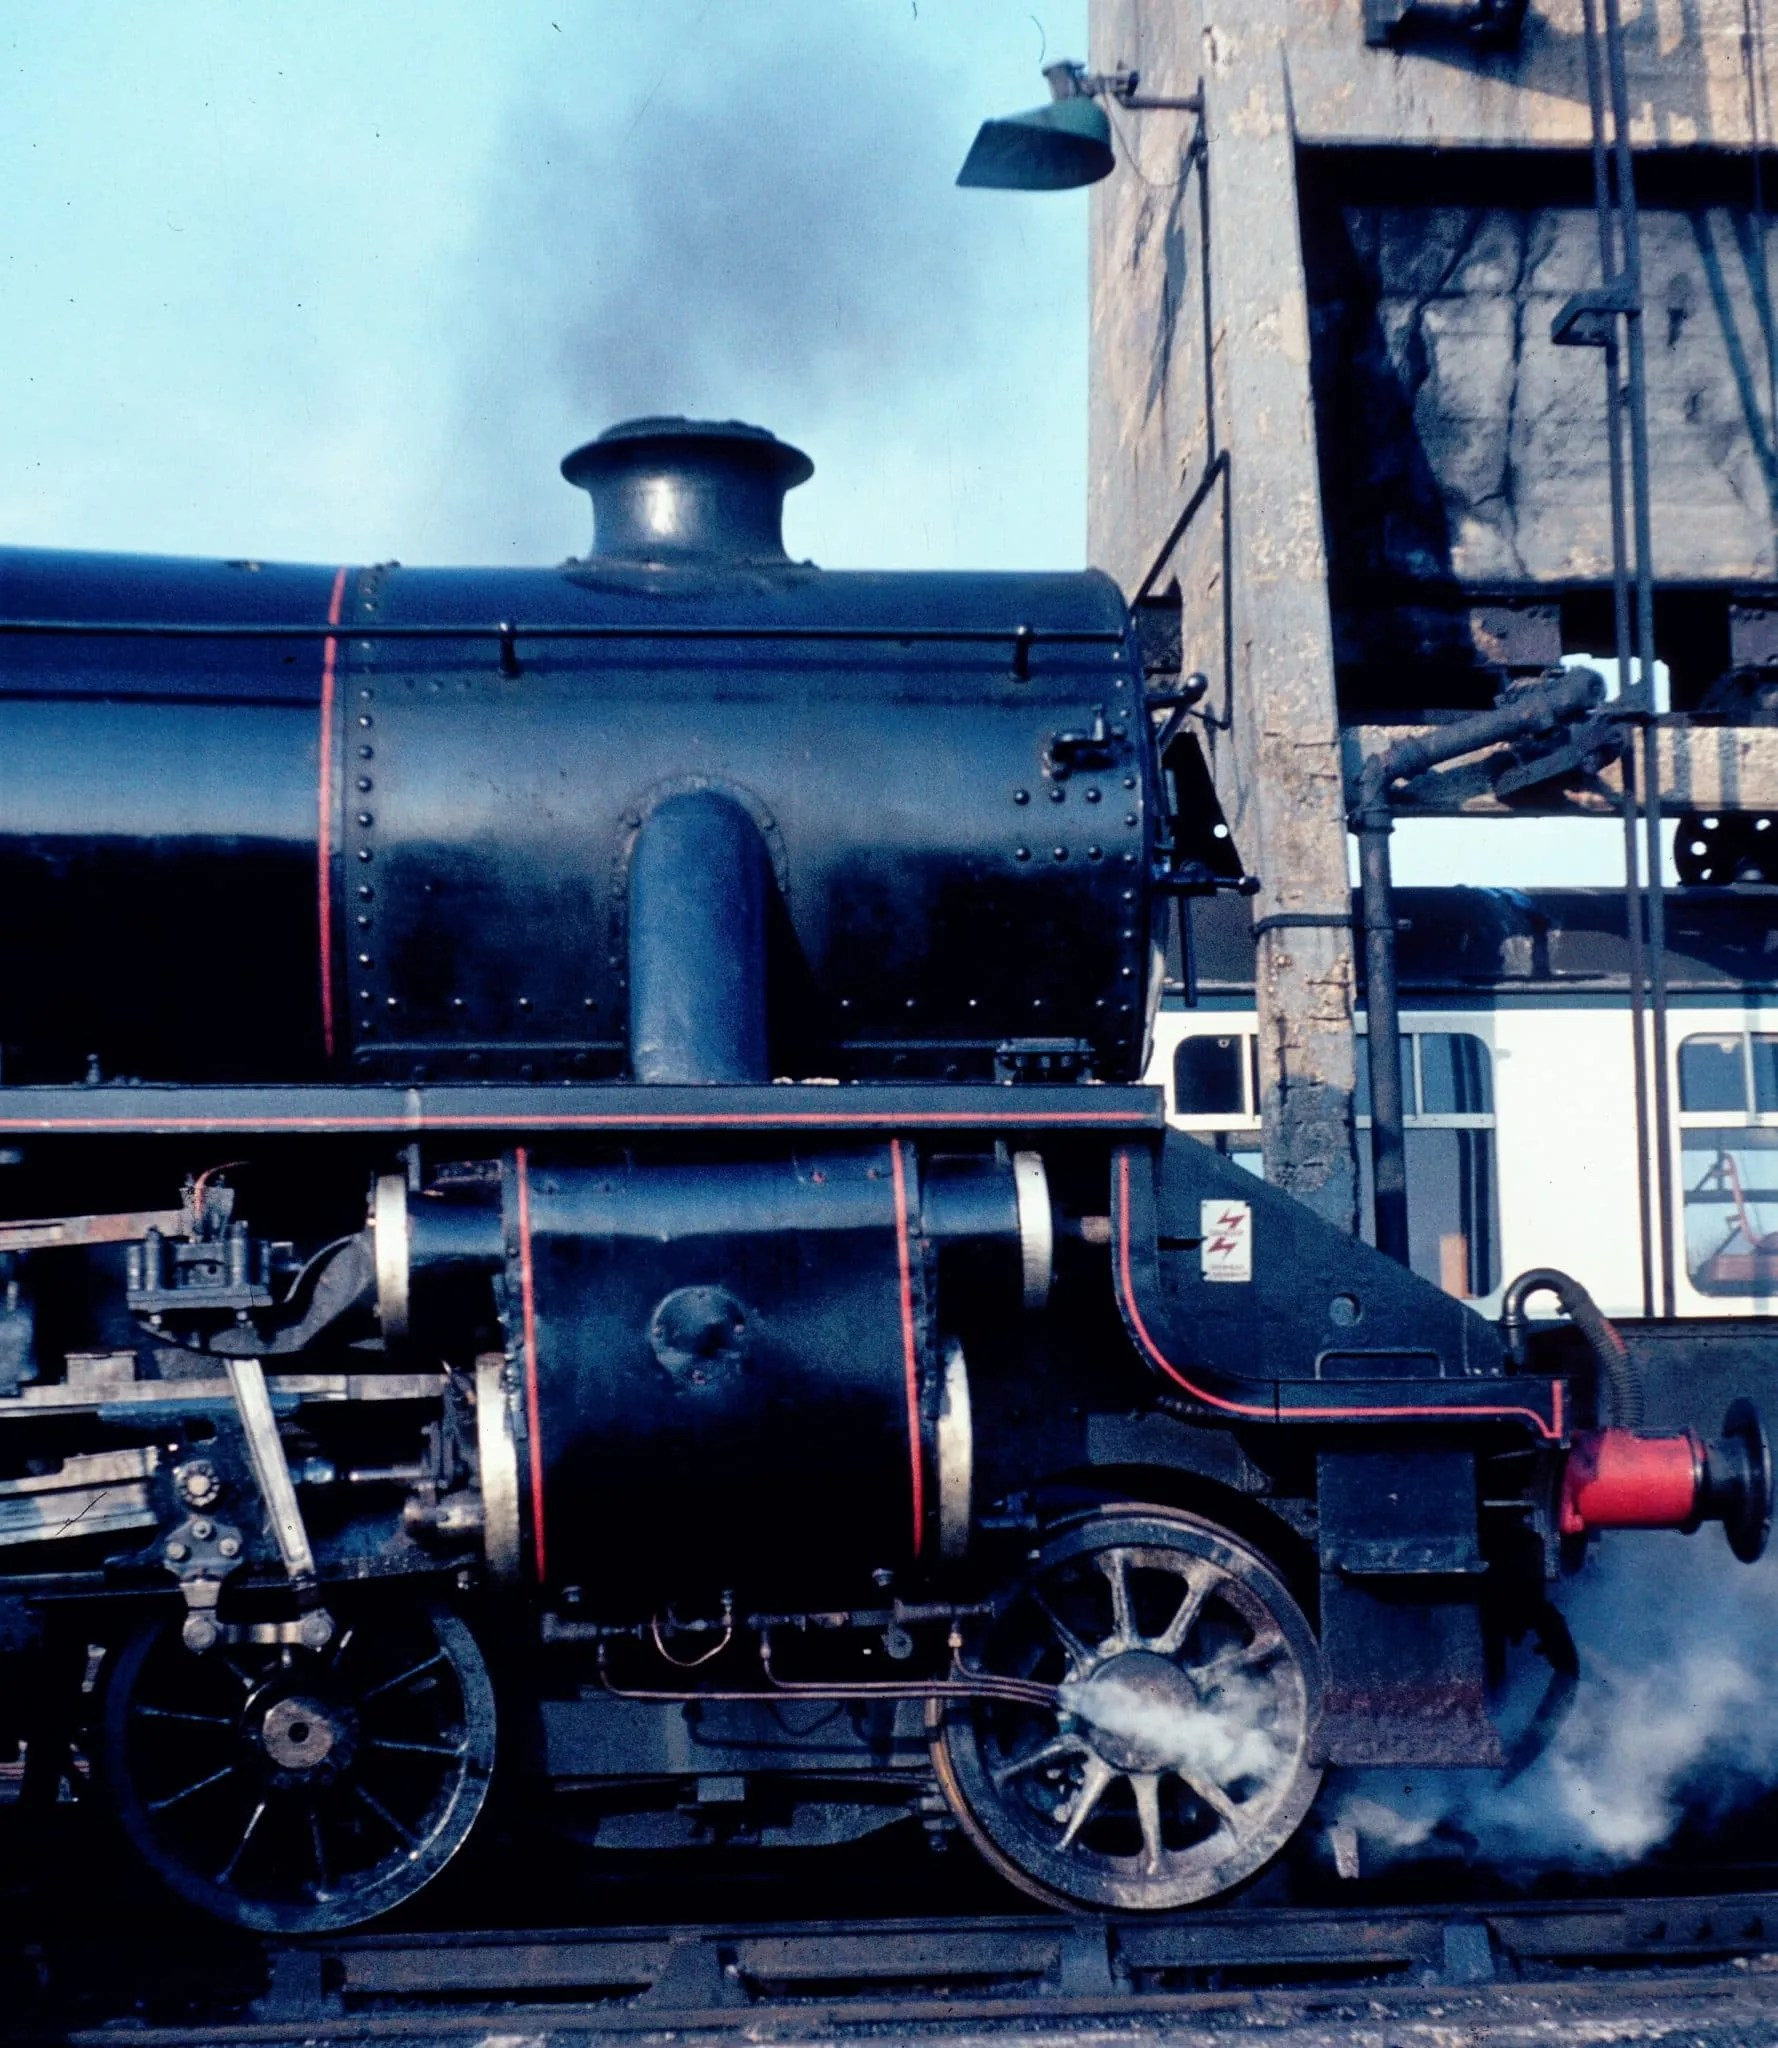 Stanier Black Five 5407